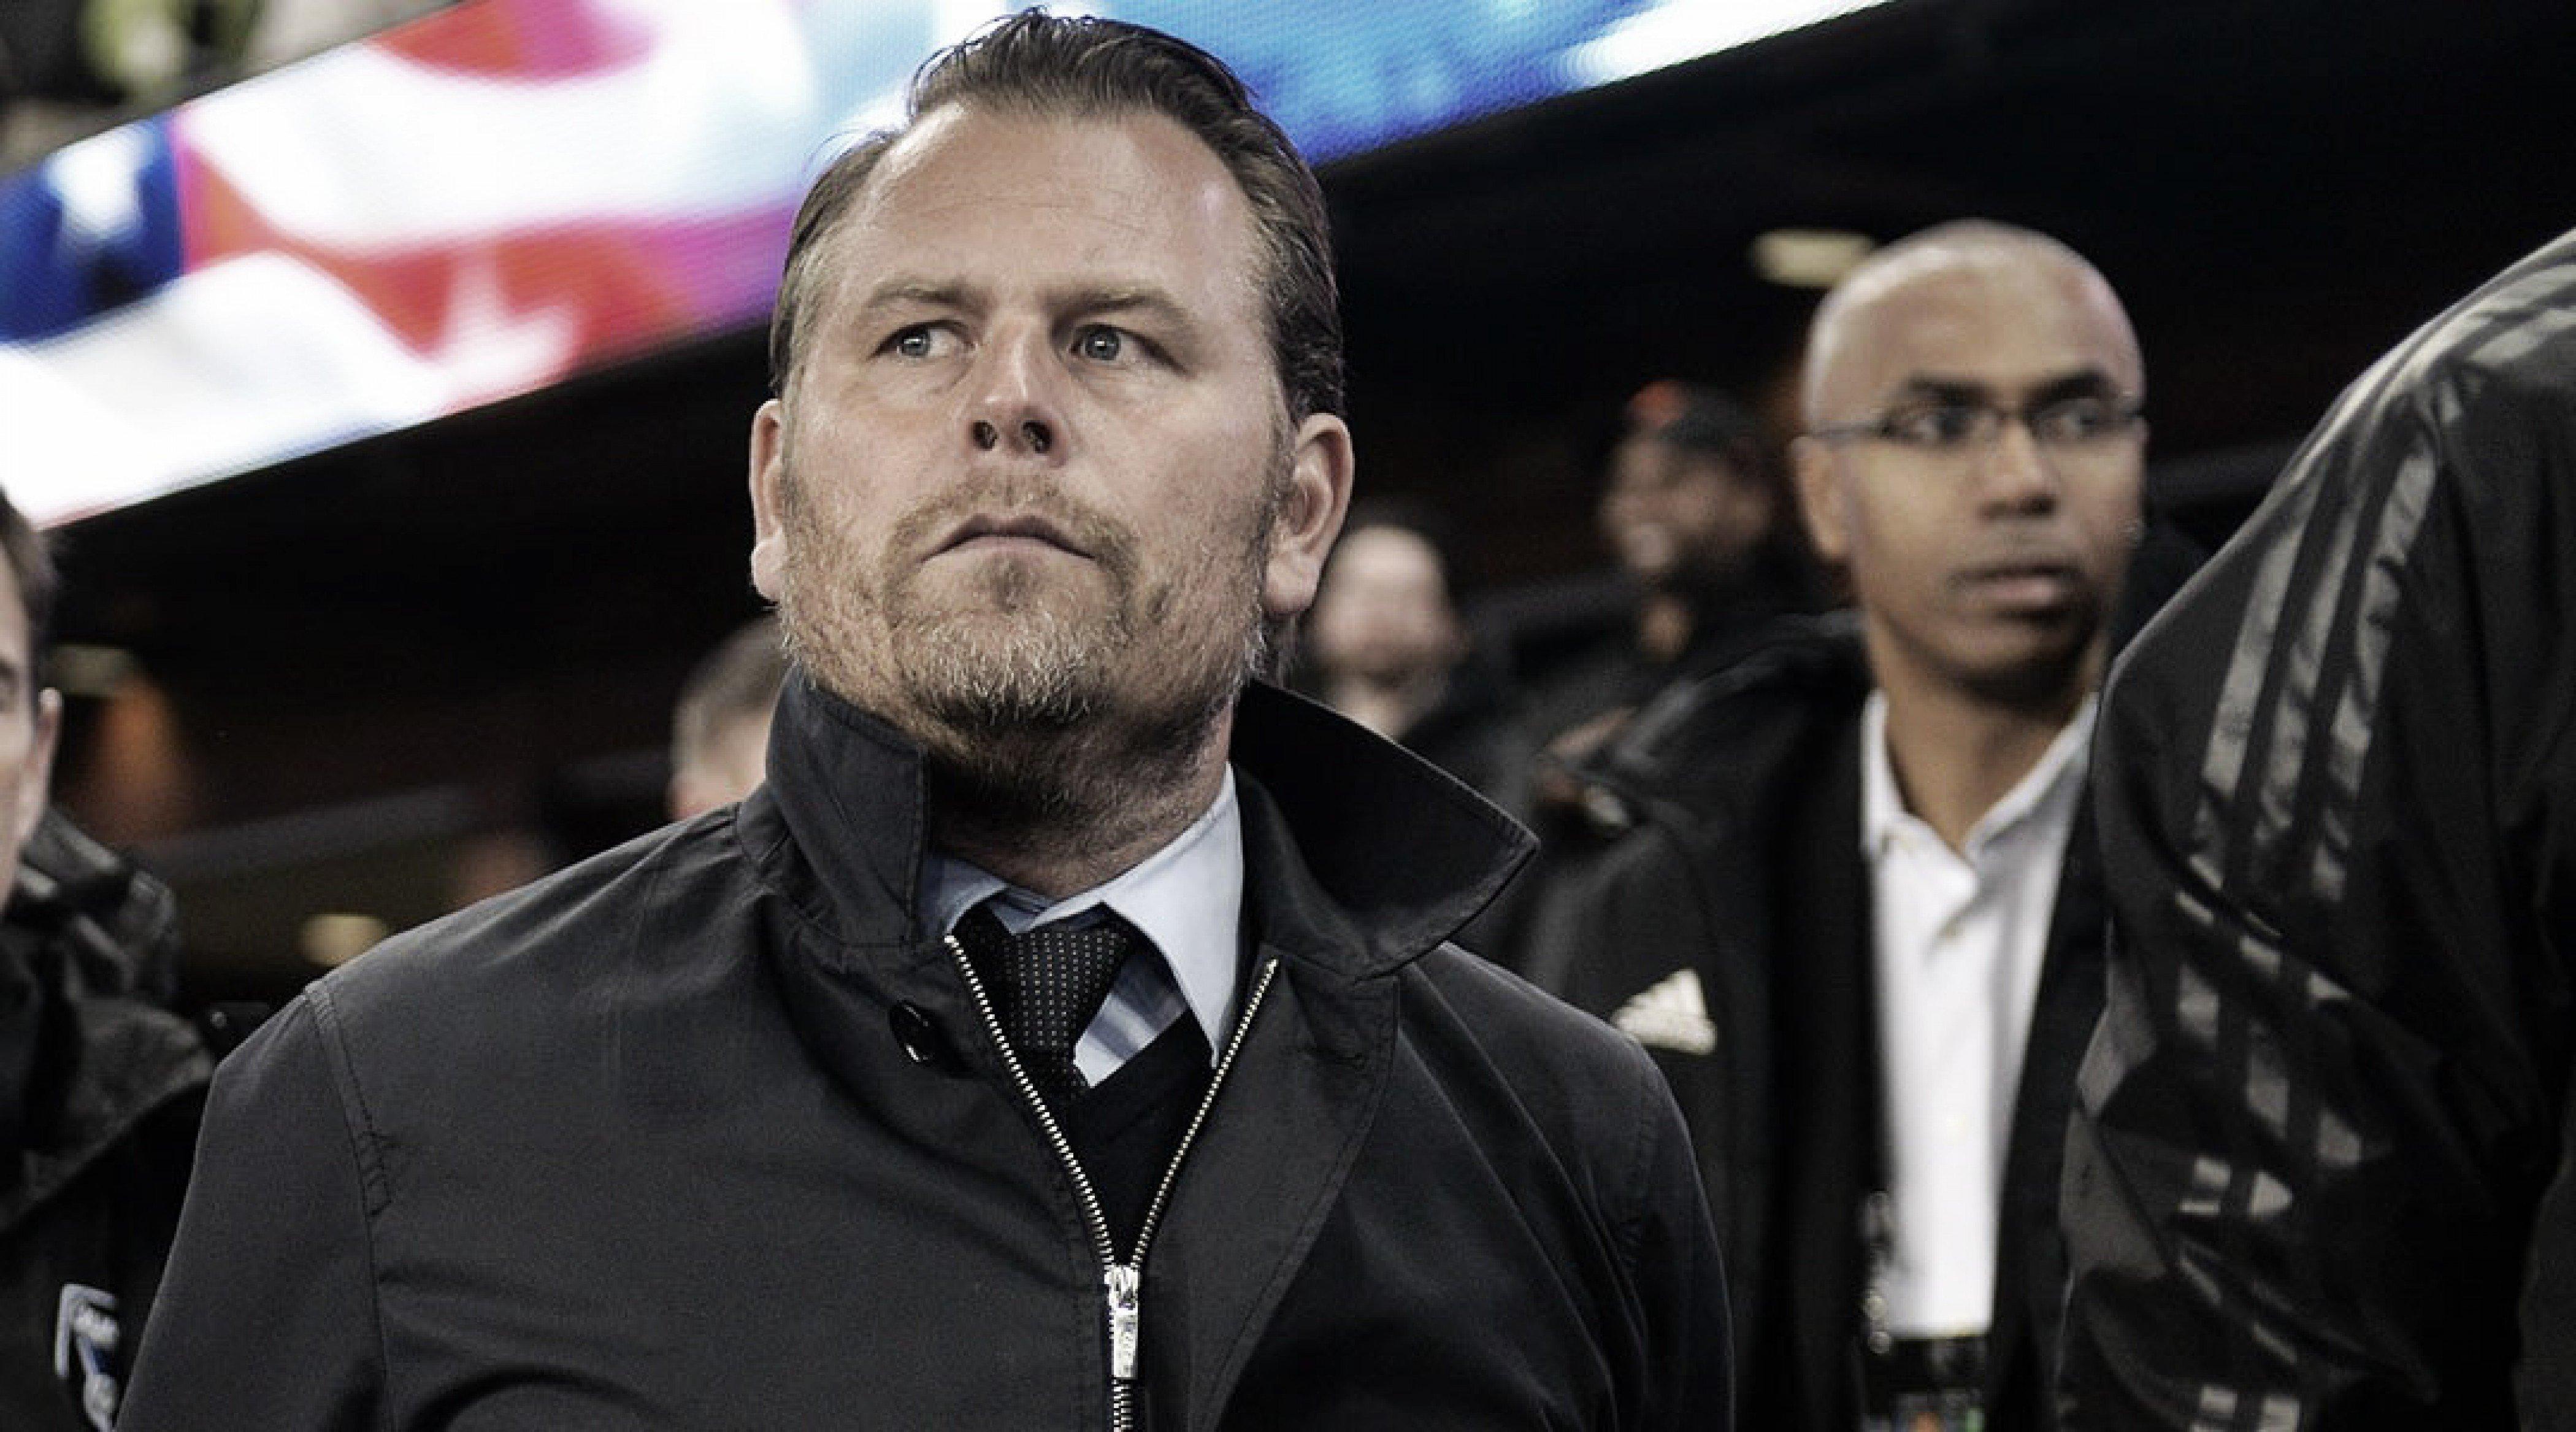 Mikael Stahre cesado como entrenador de los quakes | Fotografía: San Jose Earthquakes